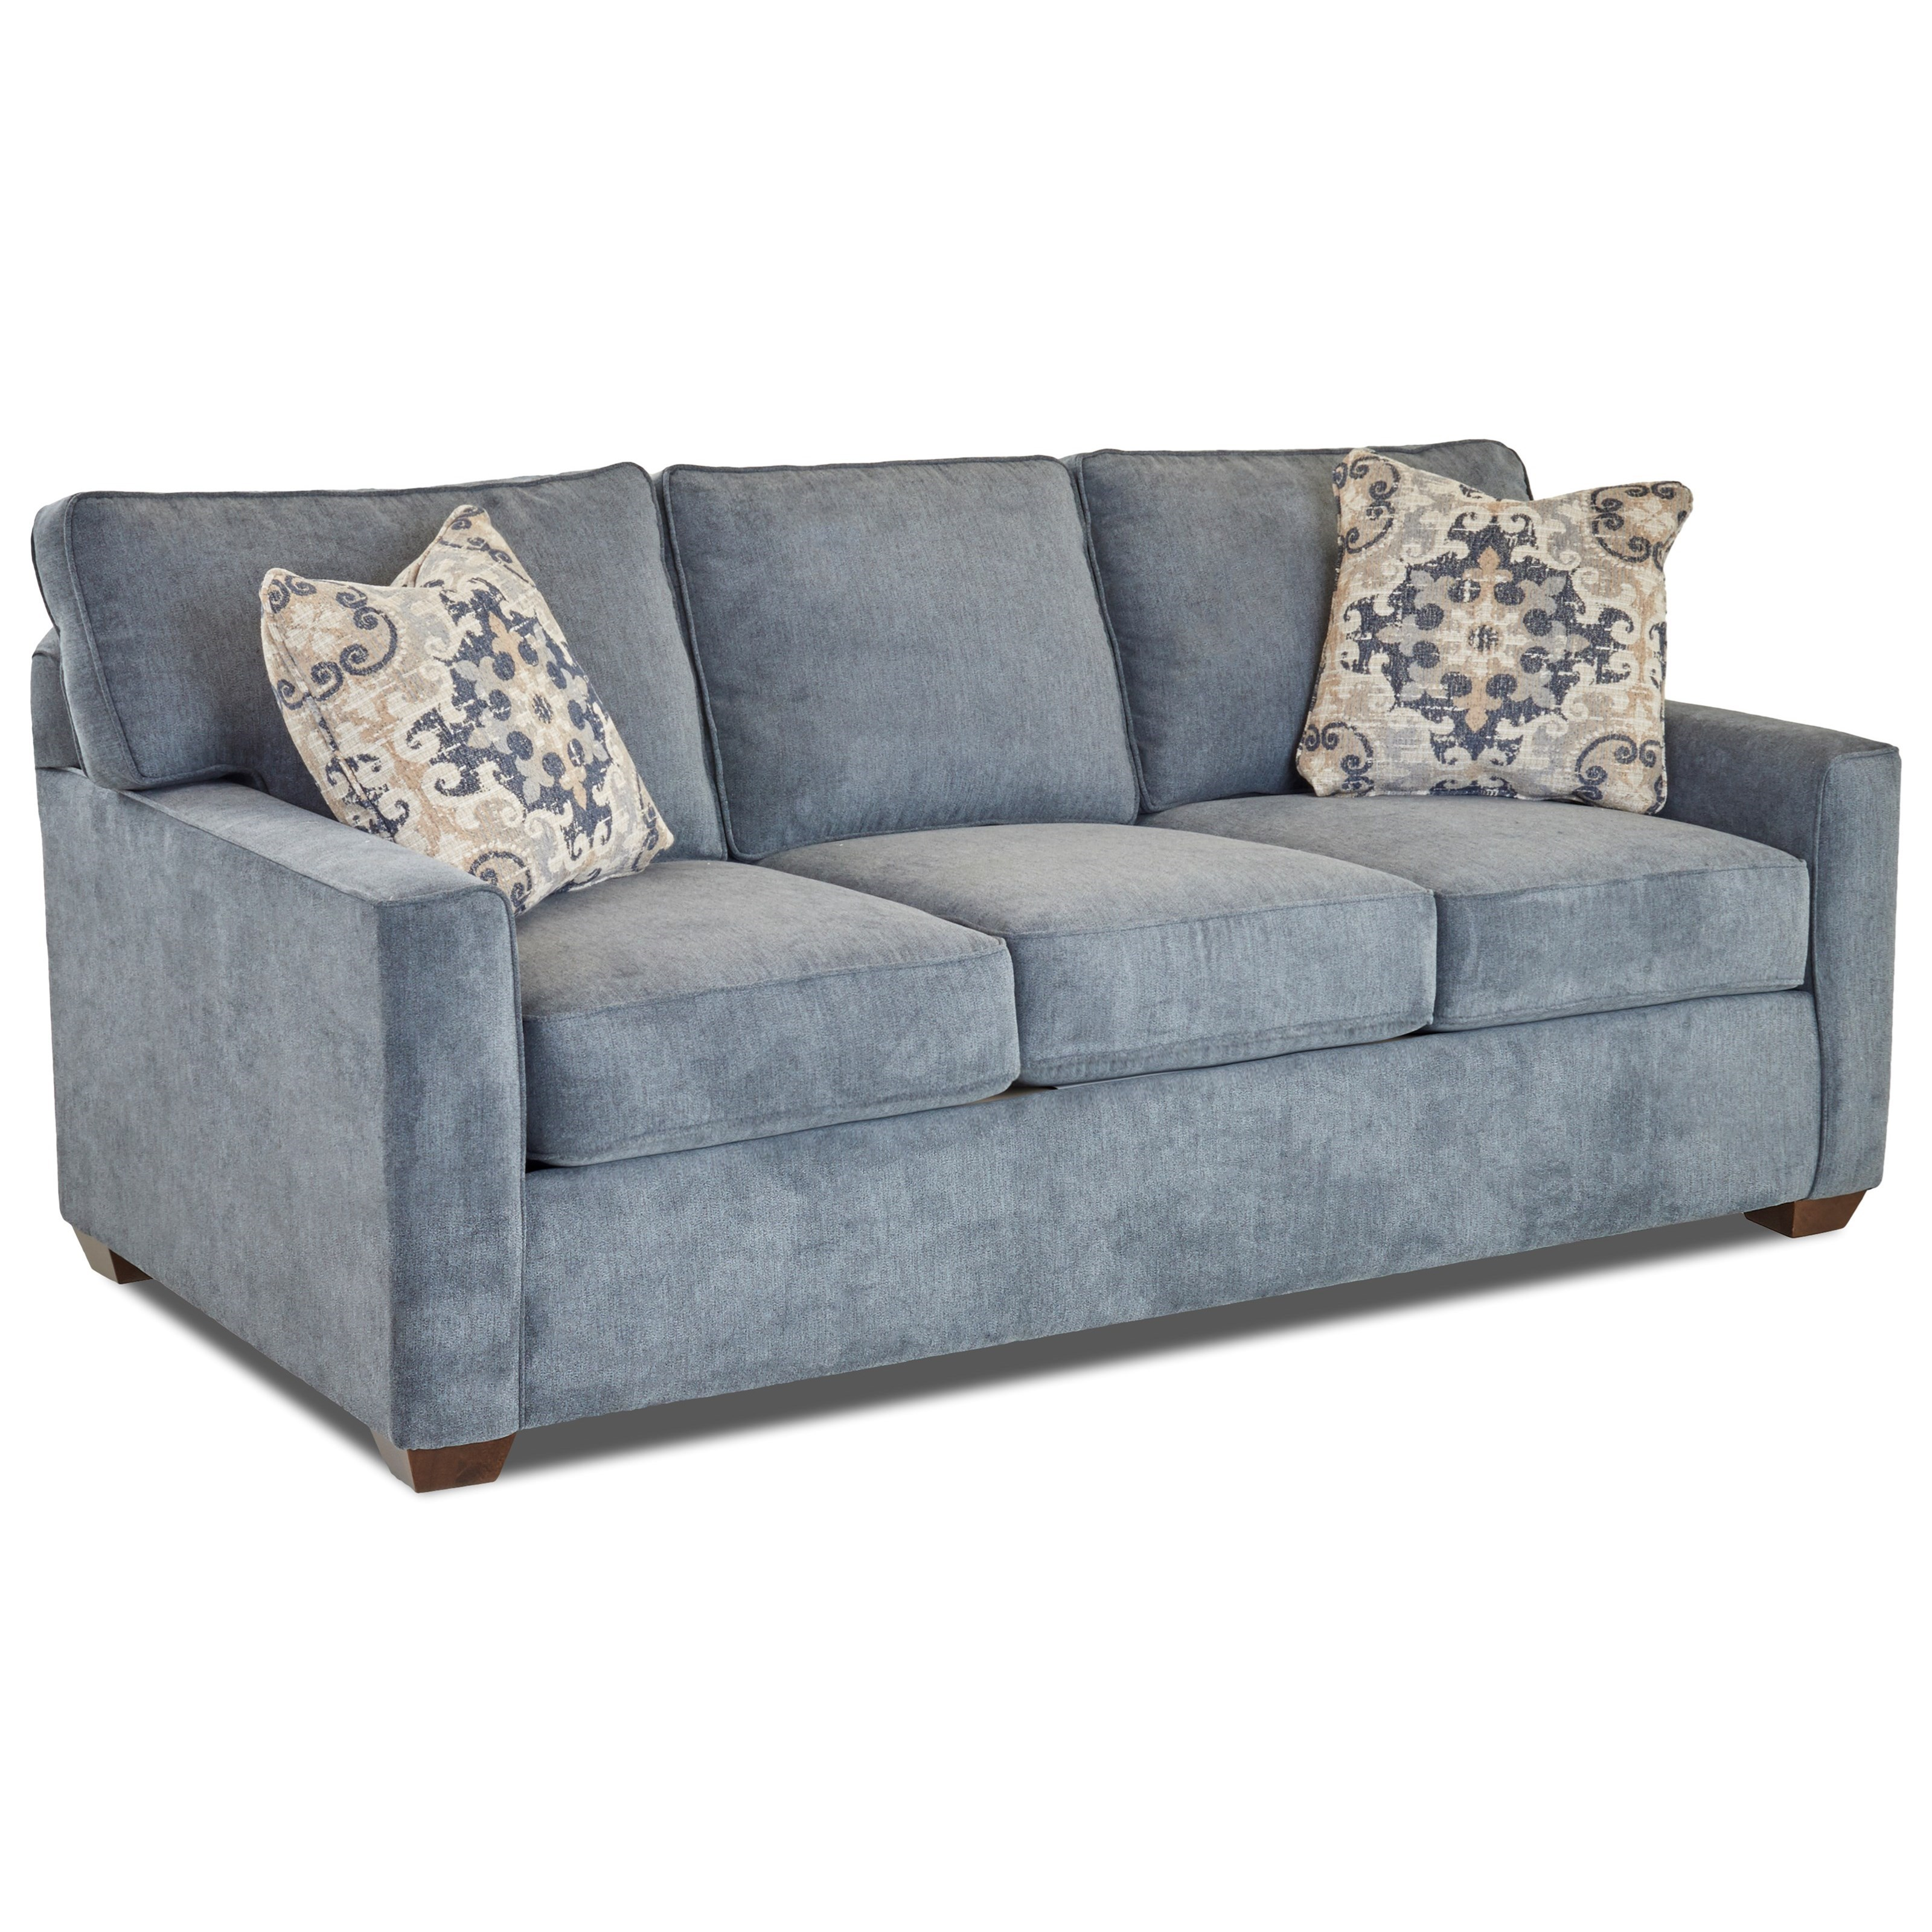 Innerspring Sleeper Sofa